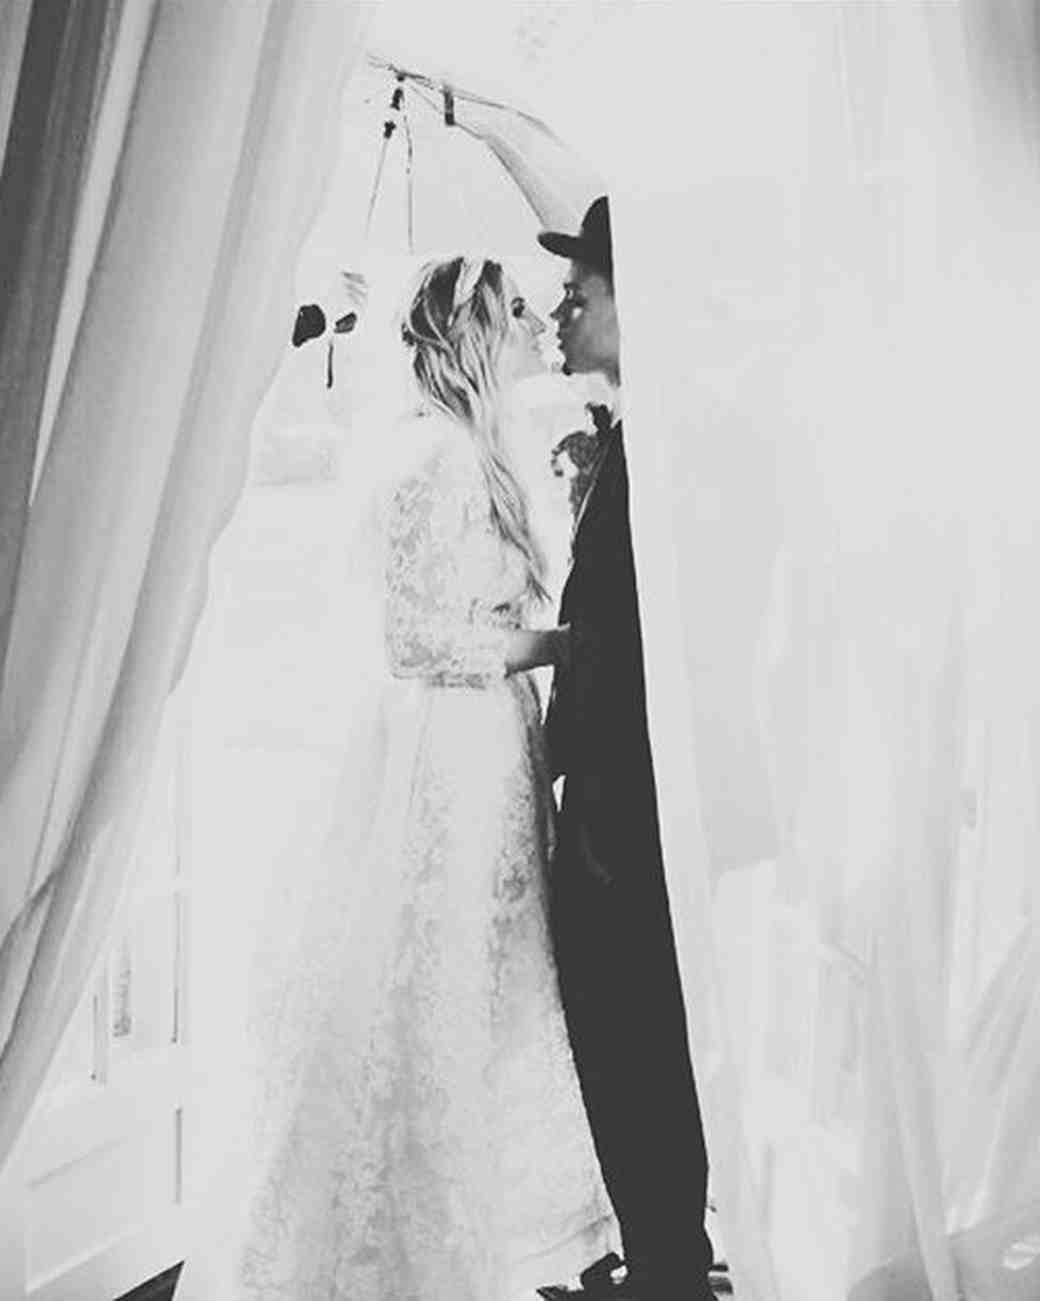 Ashlee Simpson and Evan Ross's wedding photo